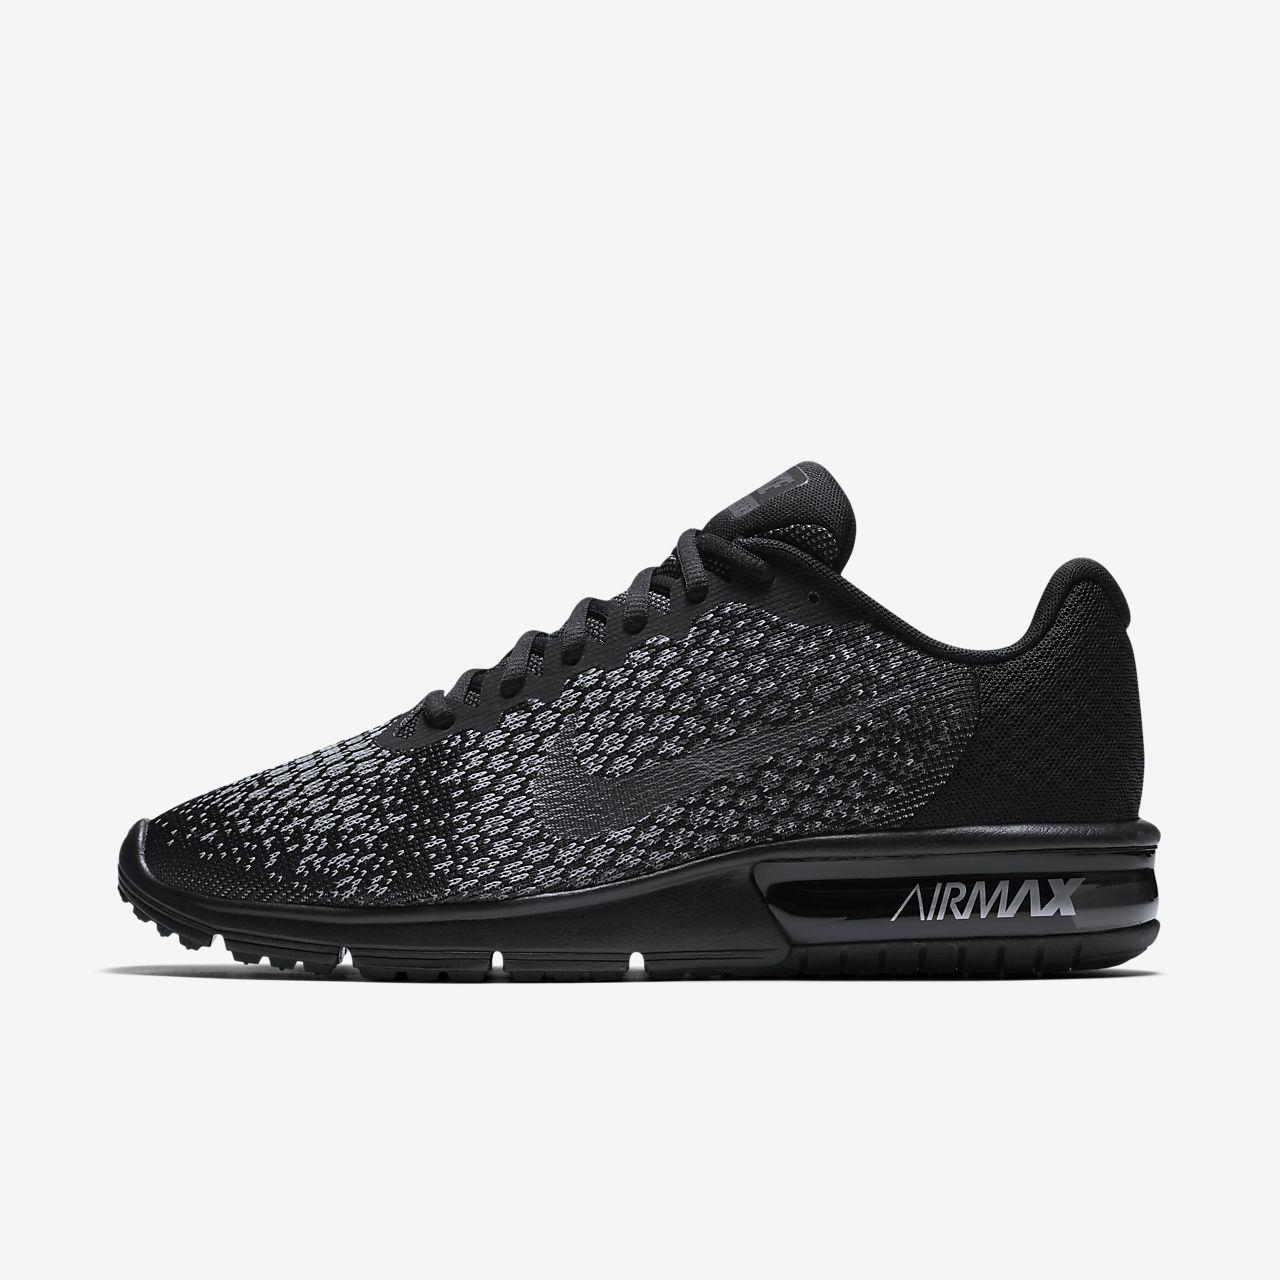 best loved e2c9c 88fda Men s Shoe. Nike Air Max Sequent 2